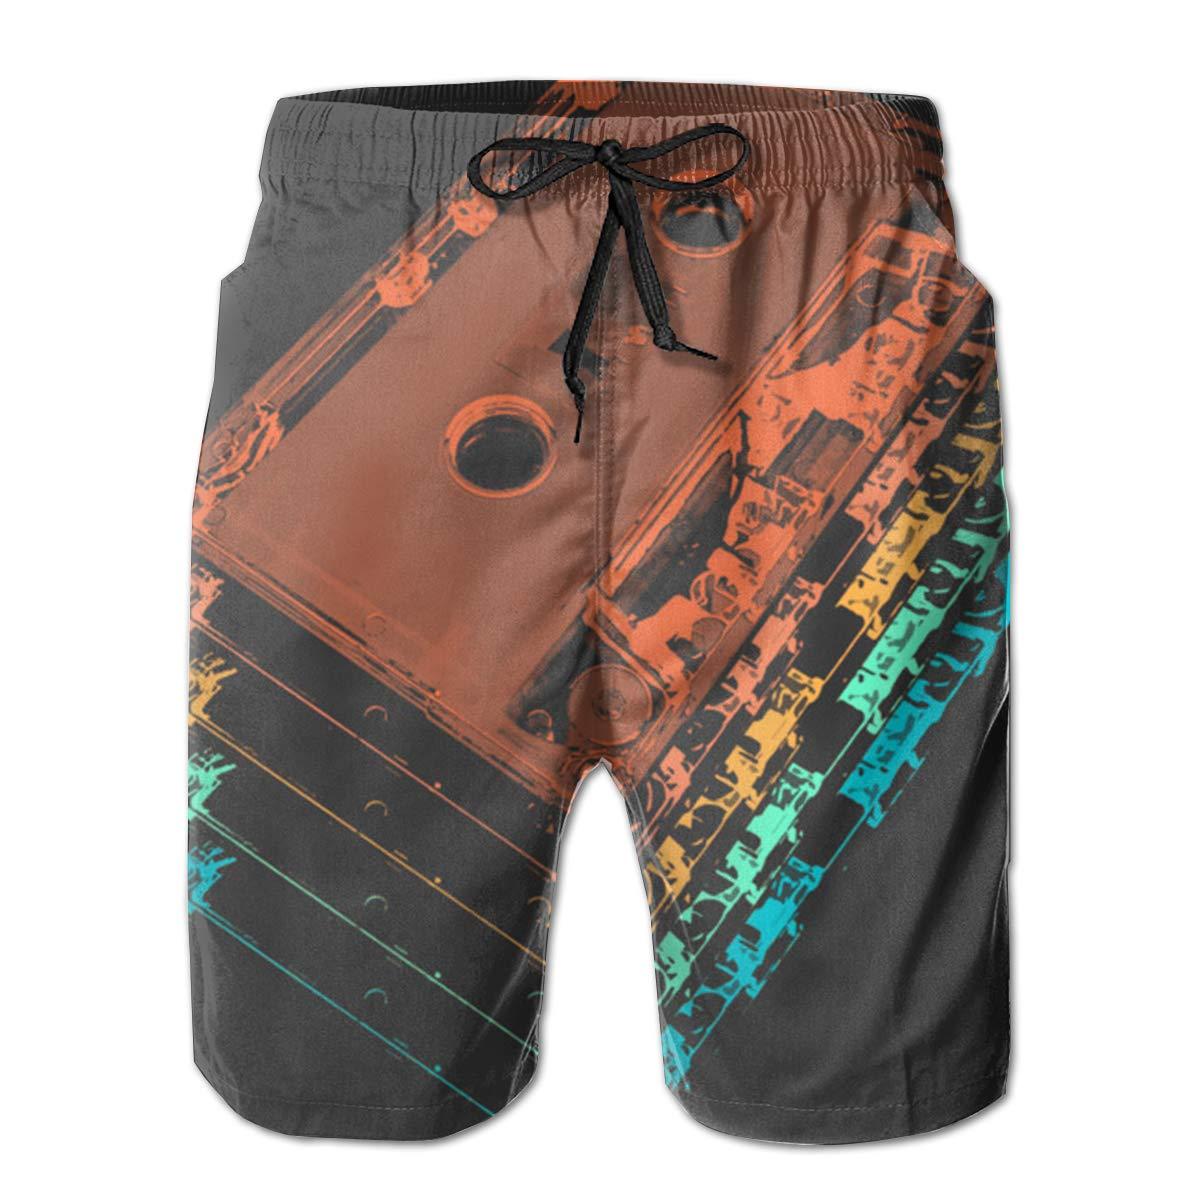 EYFlife Cassette Tapes Men/â/€s Beach Board Shorts Quick Dry Swim Truck Shorts